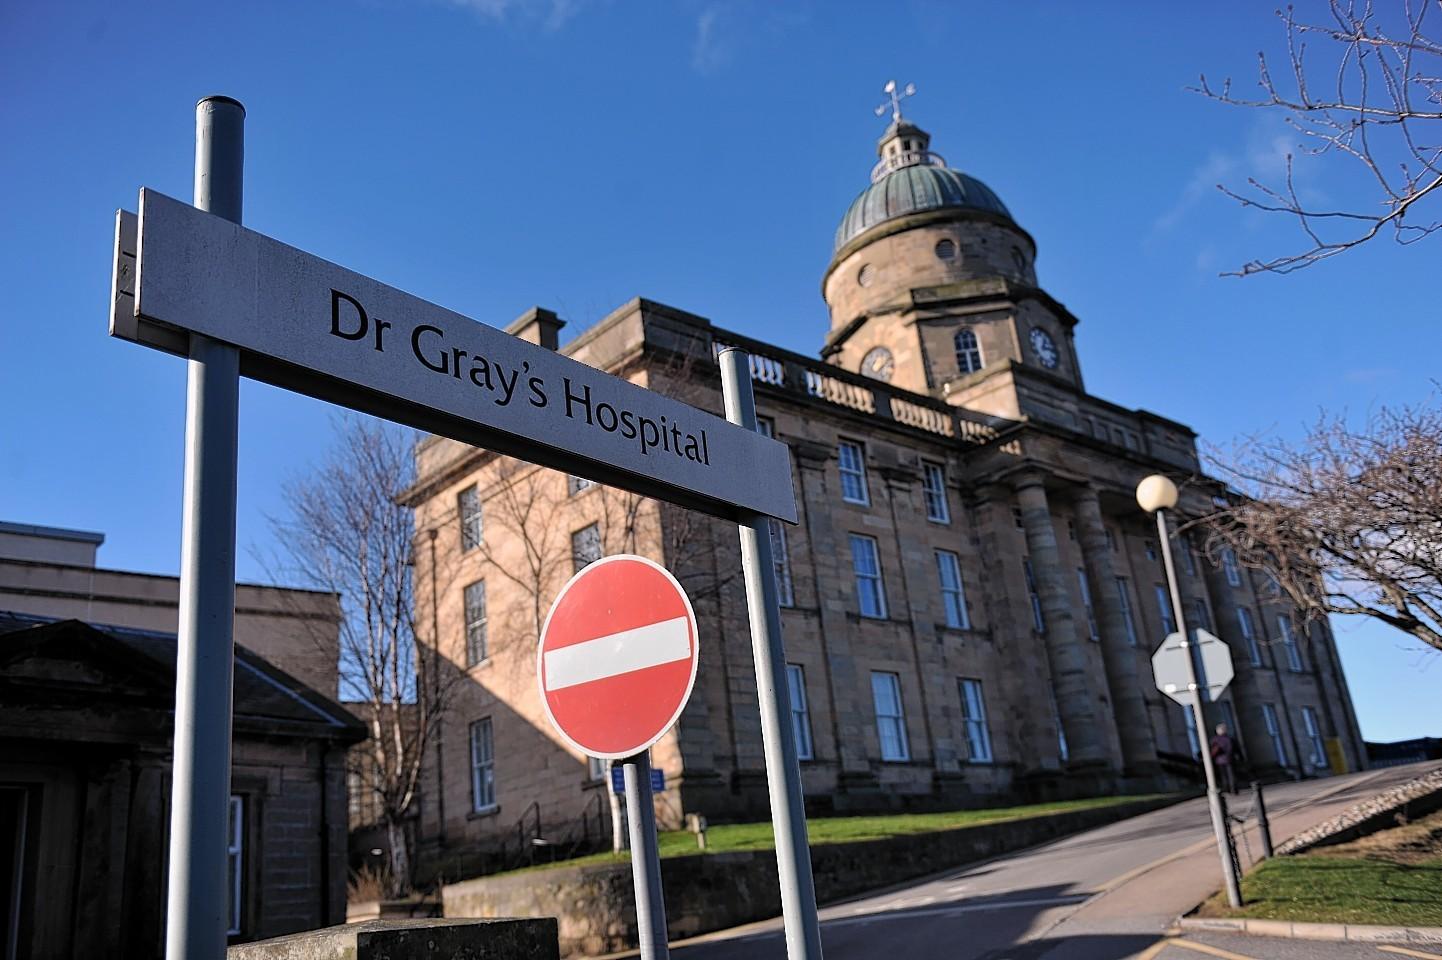 Dr Gray's Hospital in Elgin